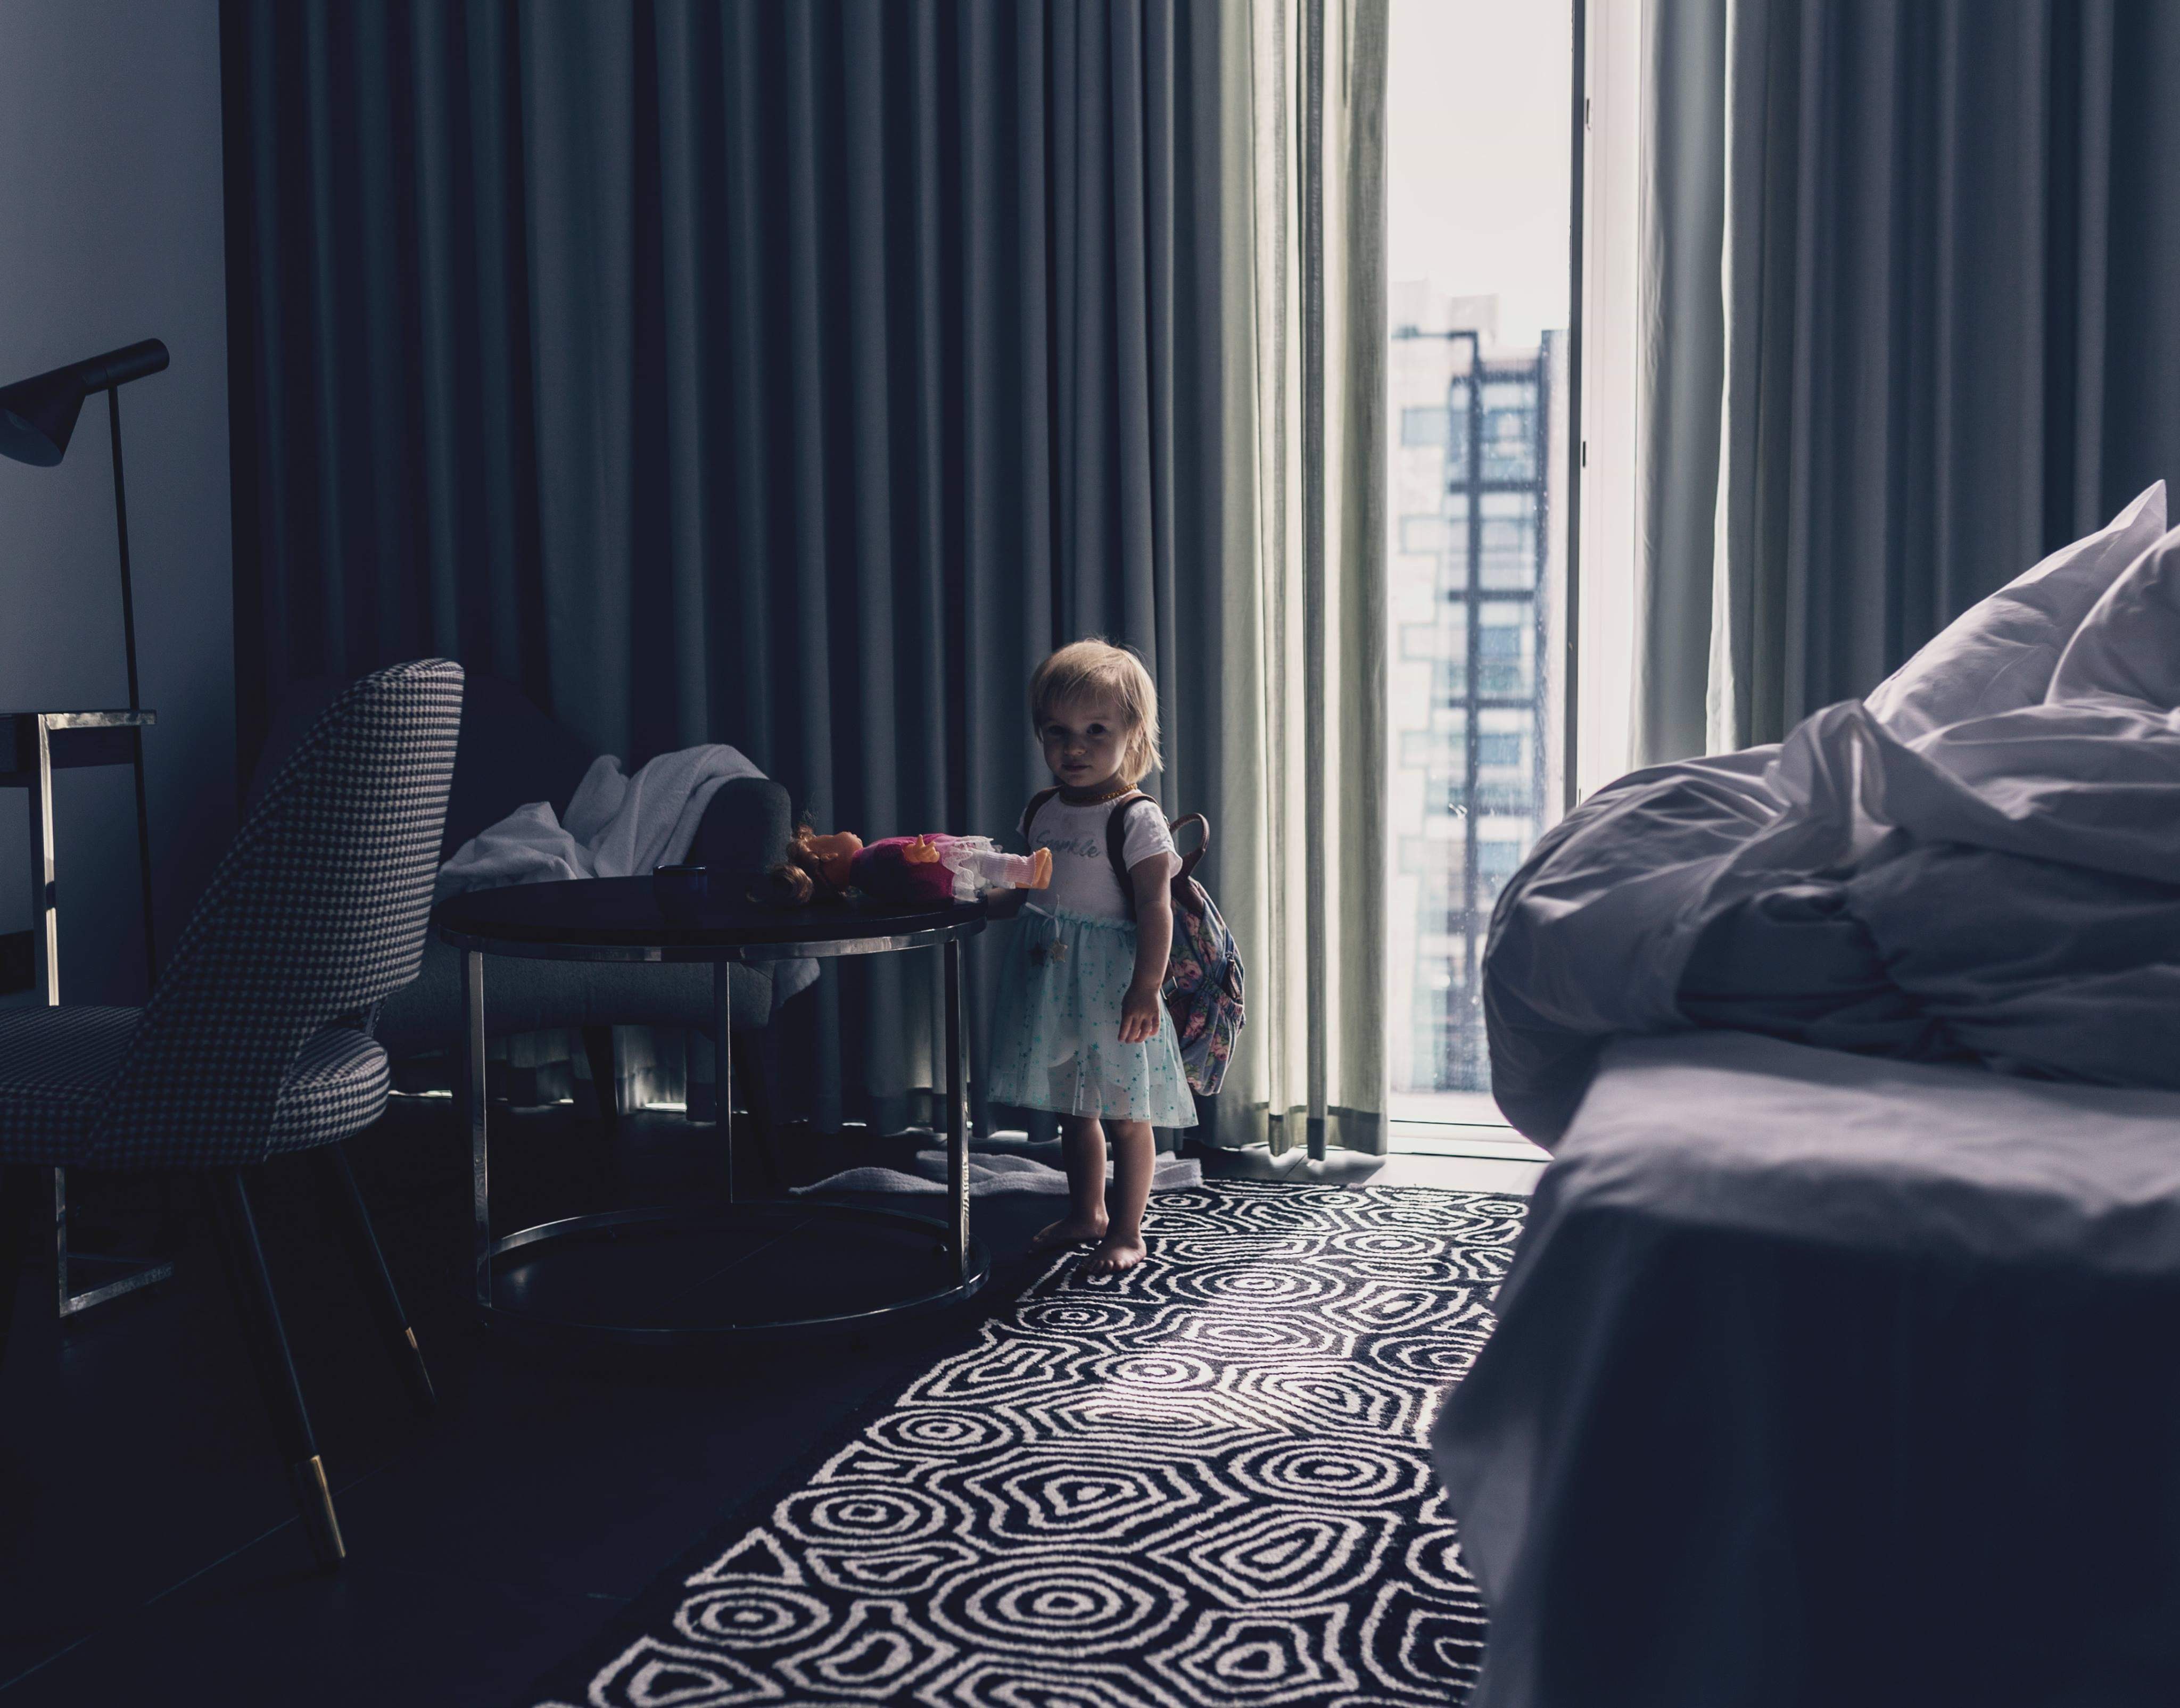 Девочка,сумка, рюкзак, свет,окно, Kamila Gurfinkel